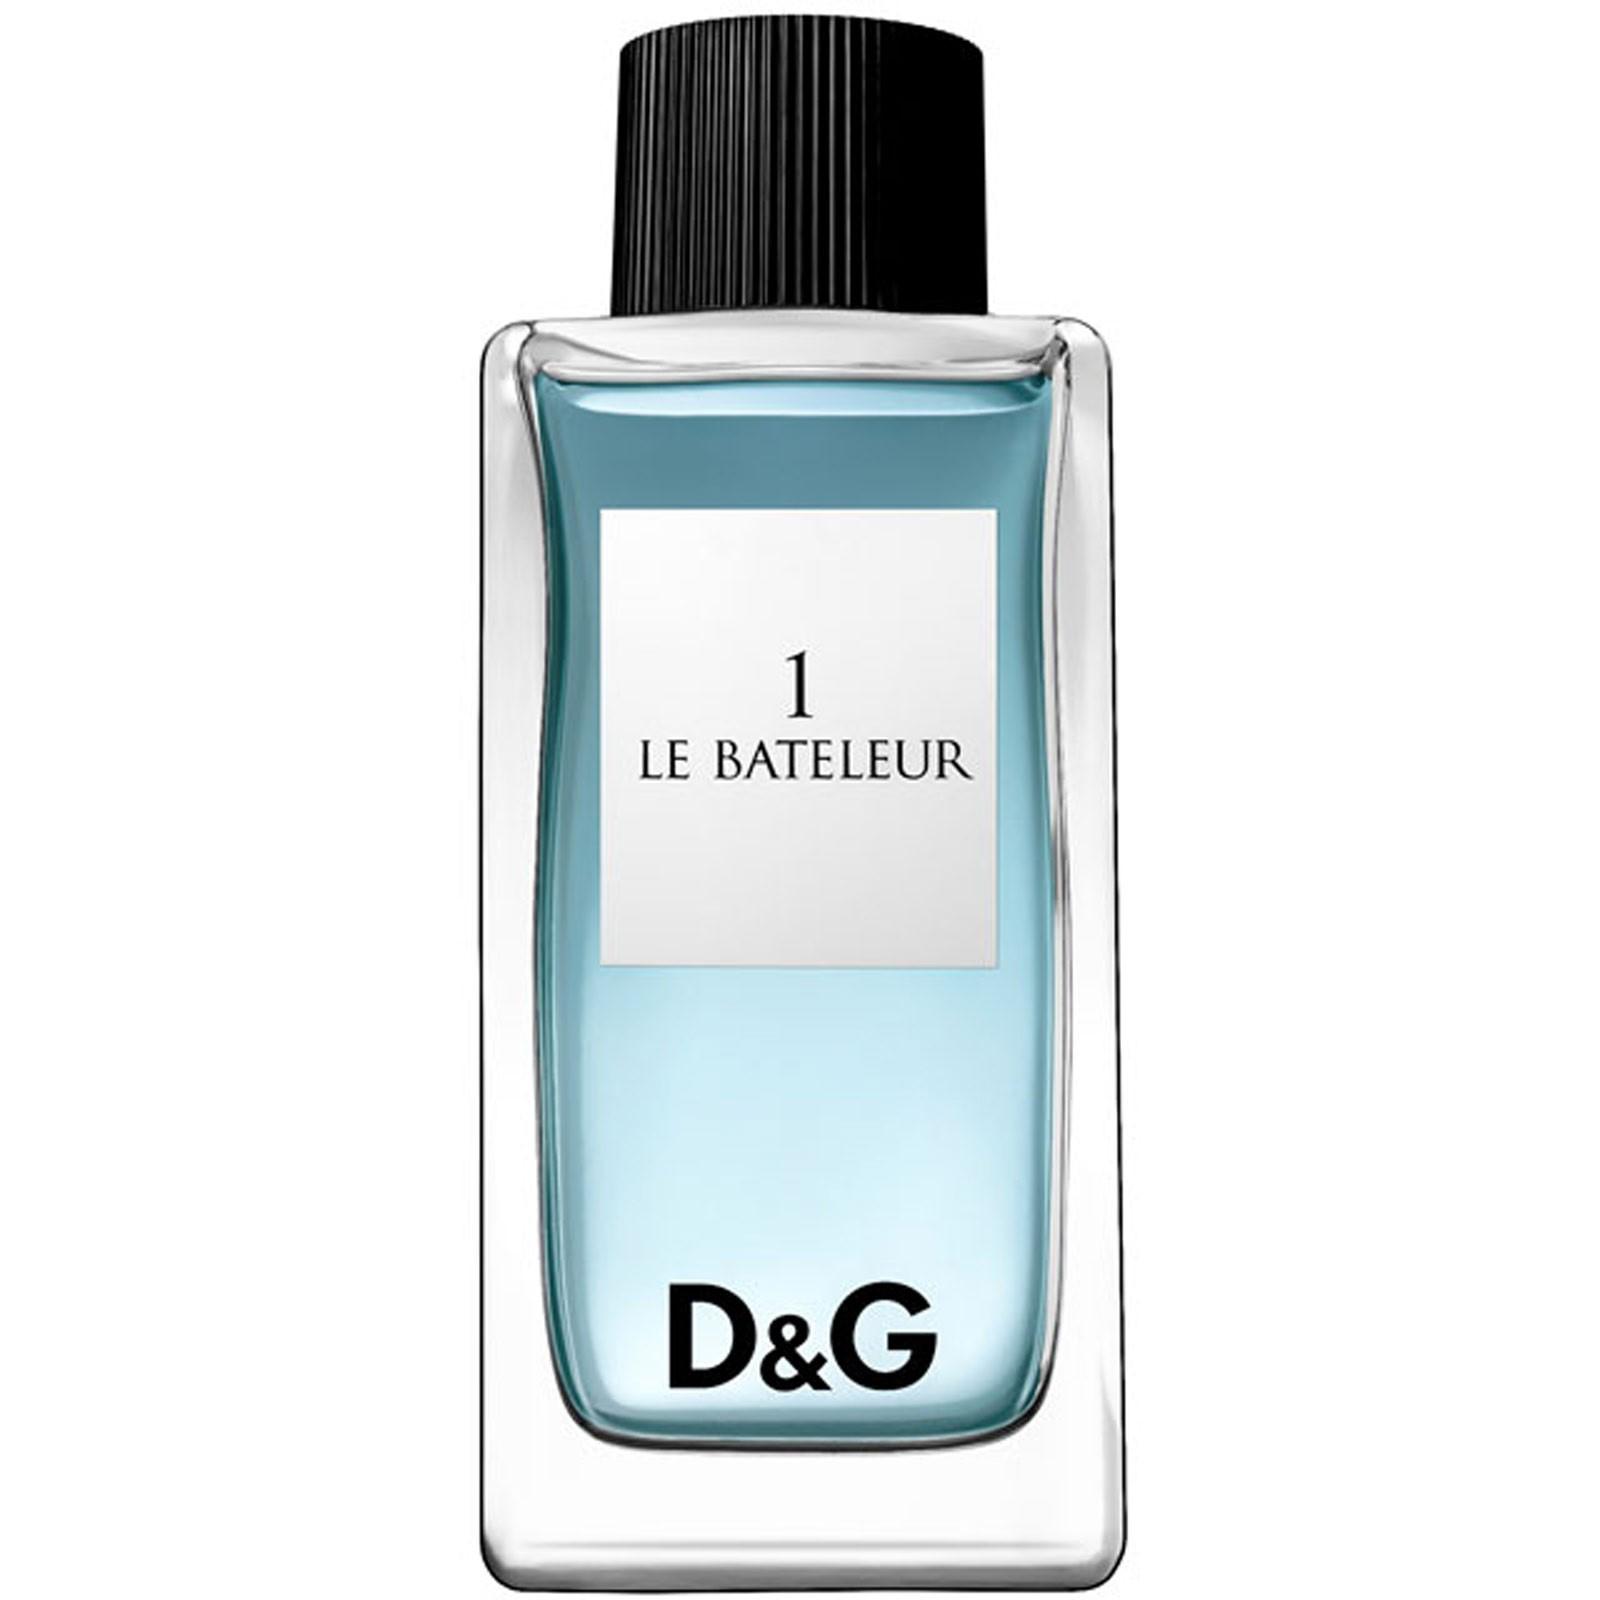 Dolce&Gabbana 1 Le Bateleur аромат для мужчин